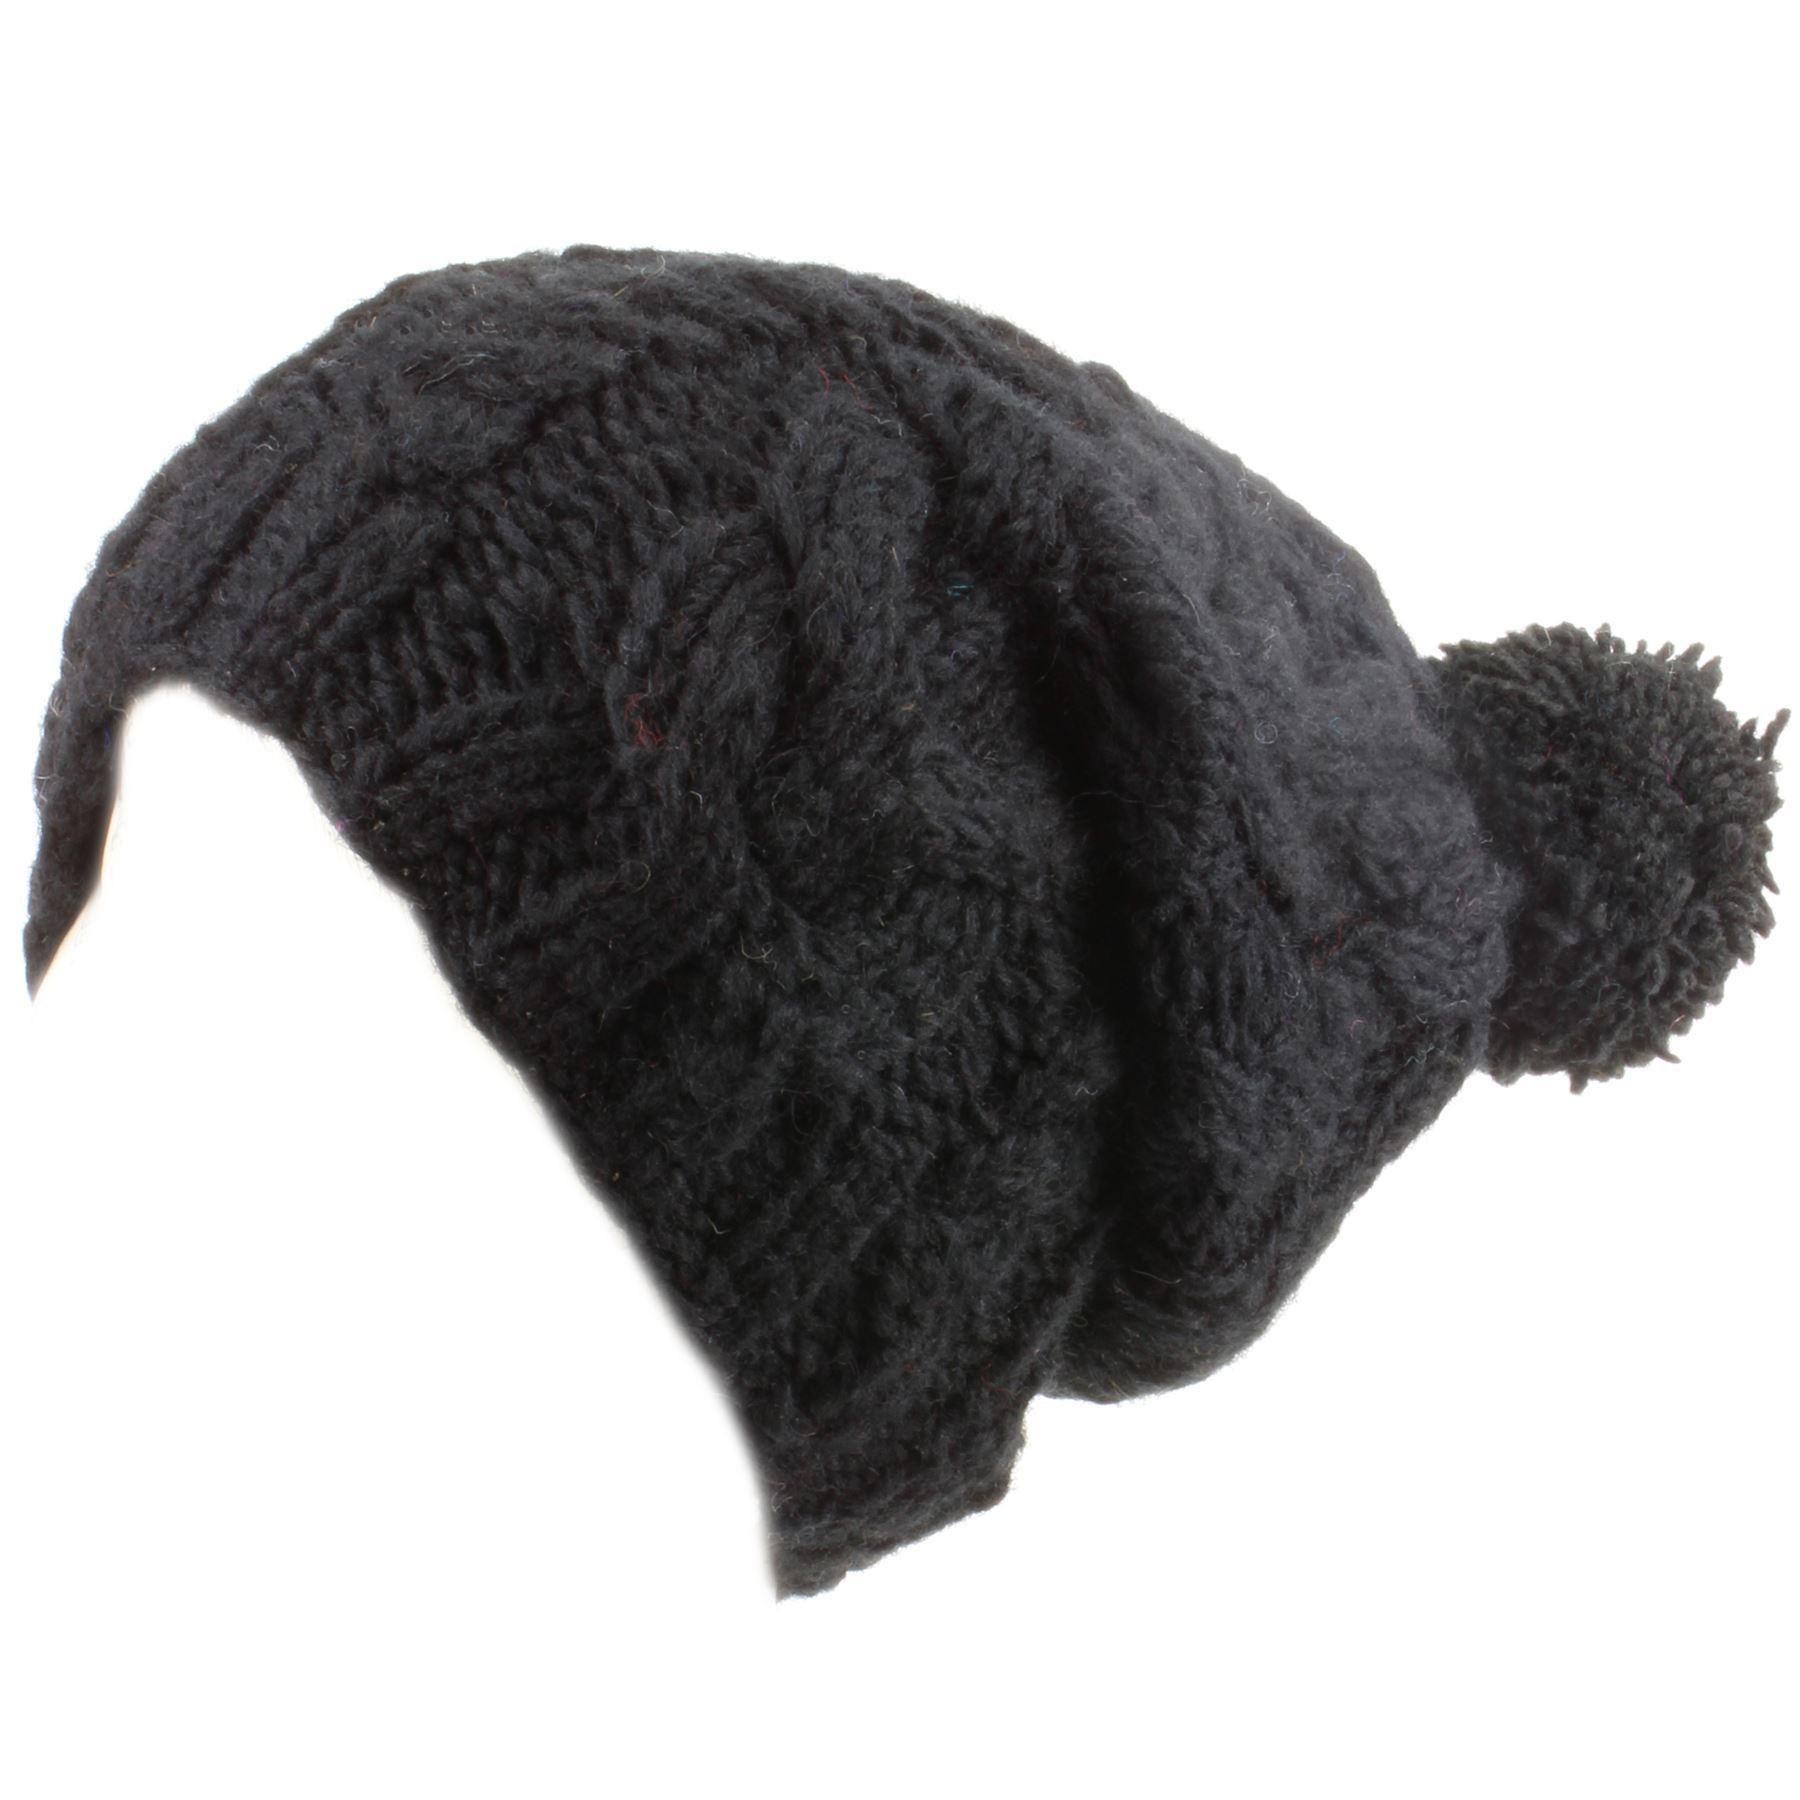 Bobble Beanie Hat Wool Baggy Slouch Cable knit Men Ladies Warm ... 3b6d48874ce